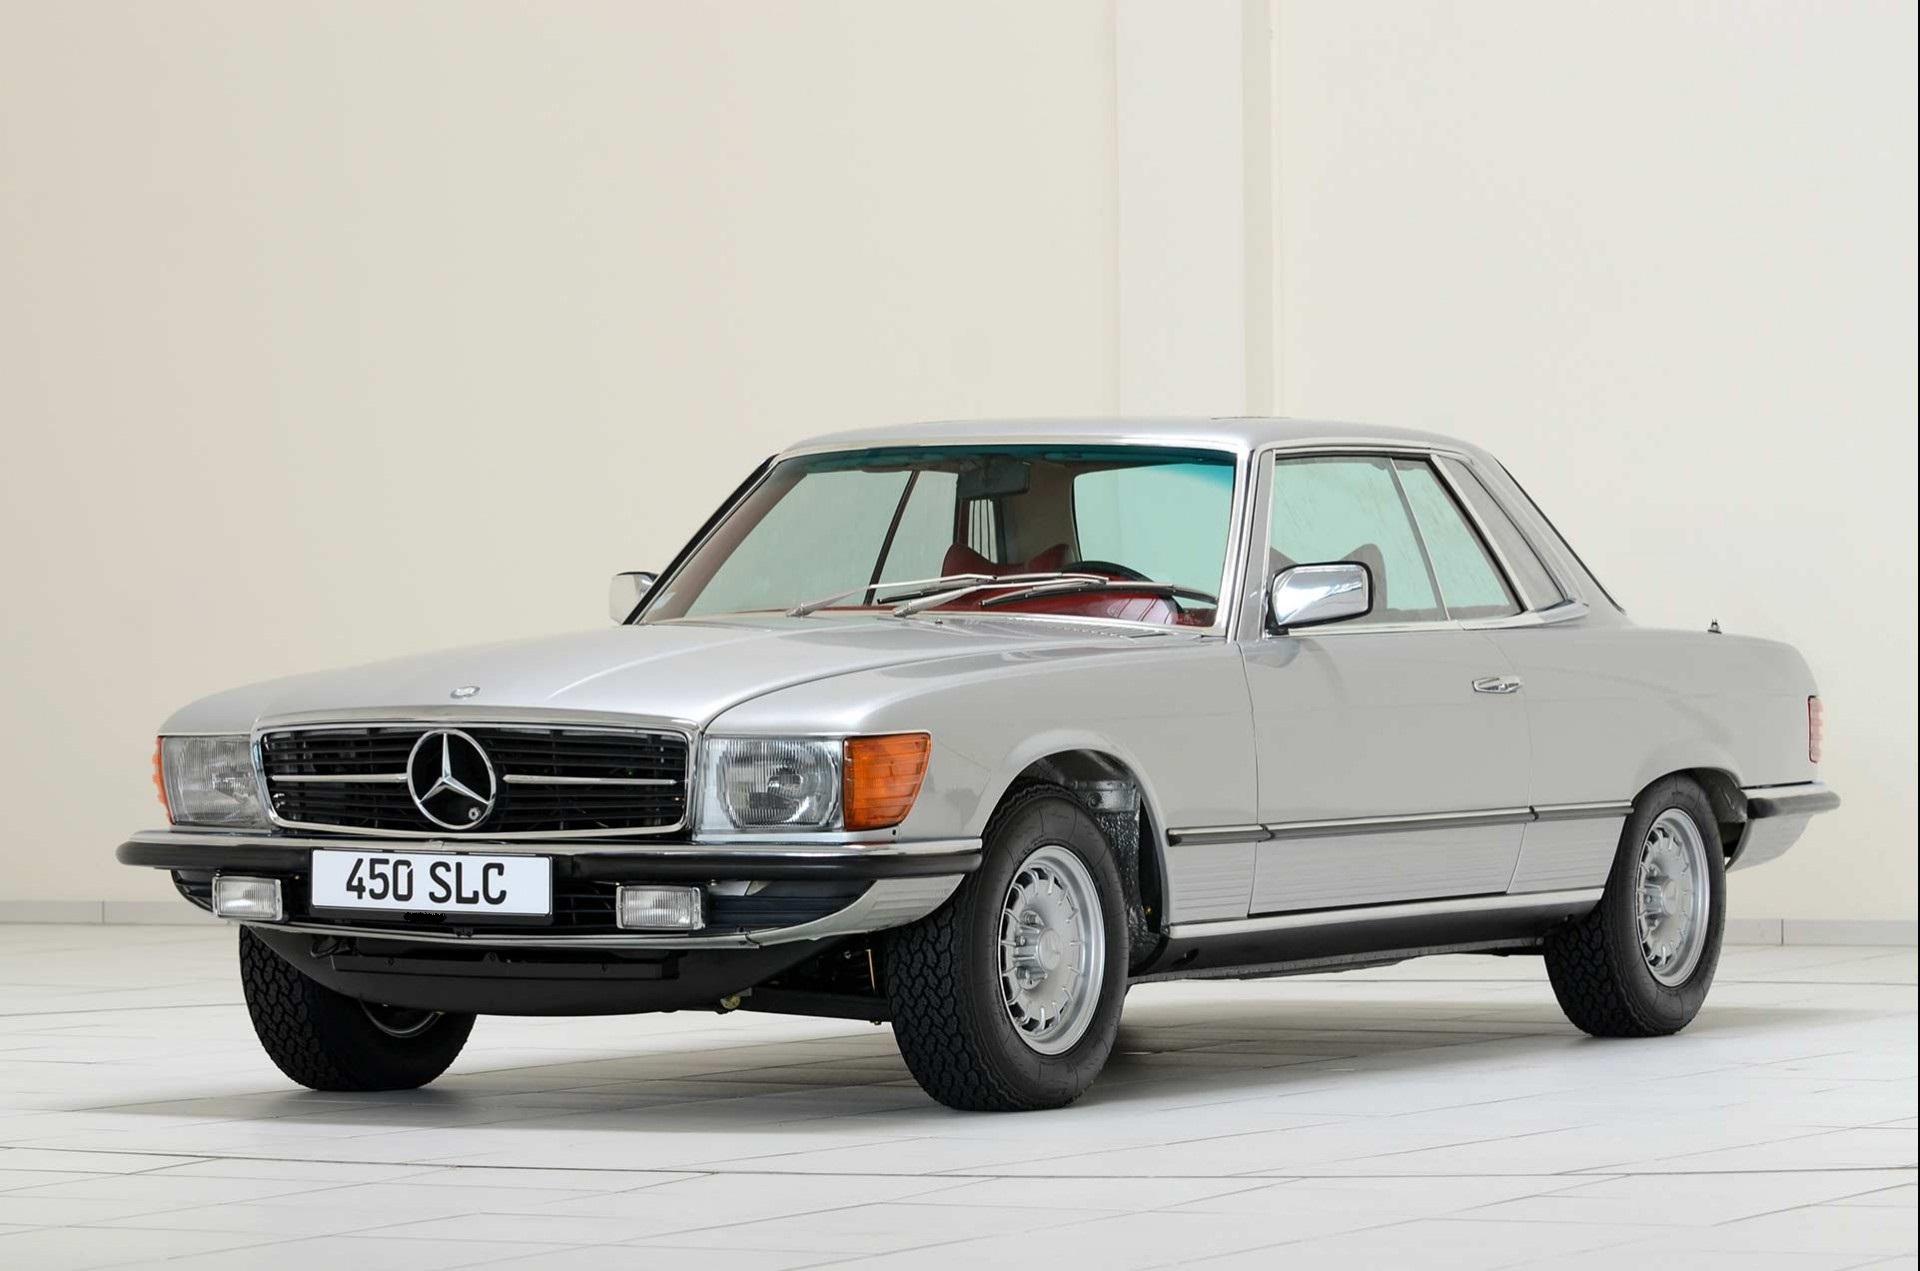 coupe Mercedes-Benz SLC 450